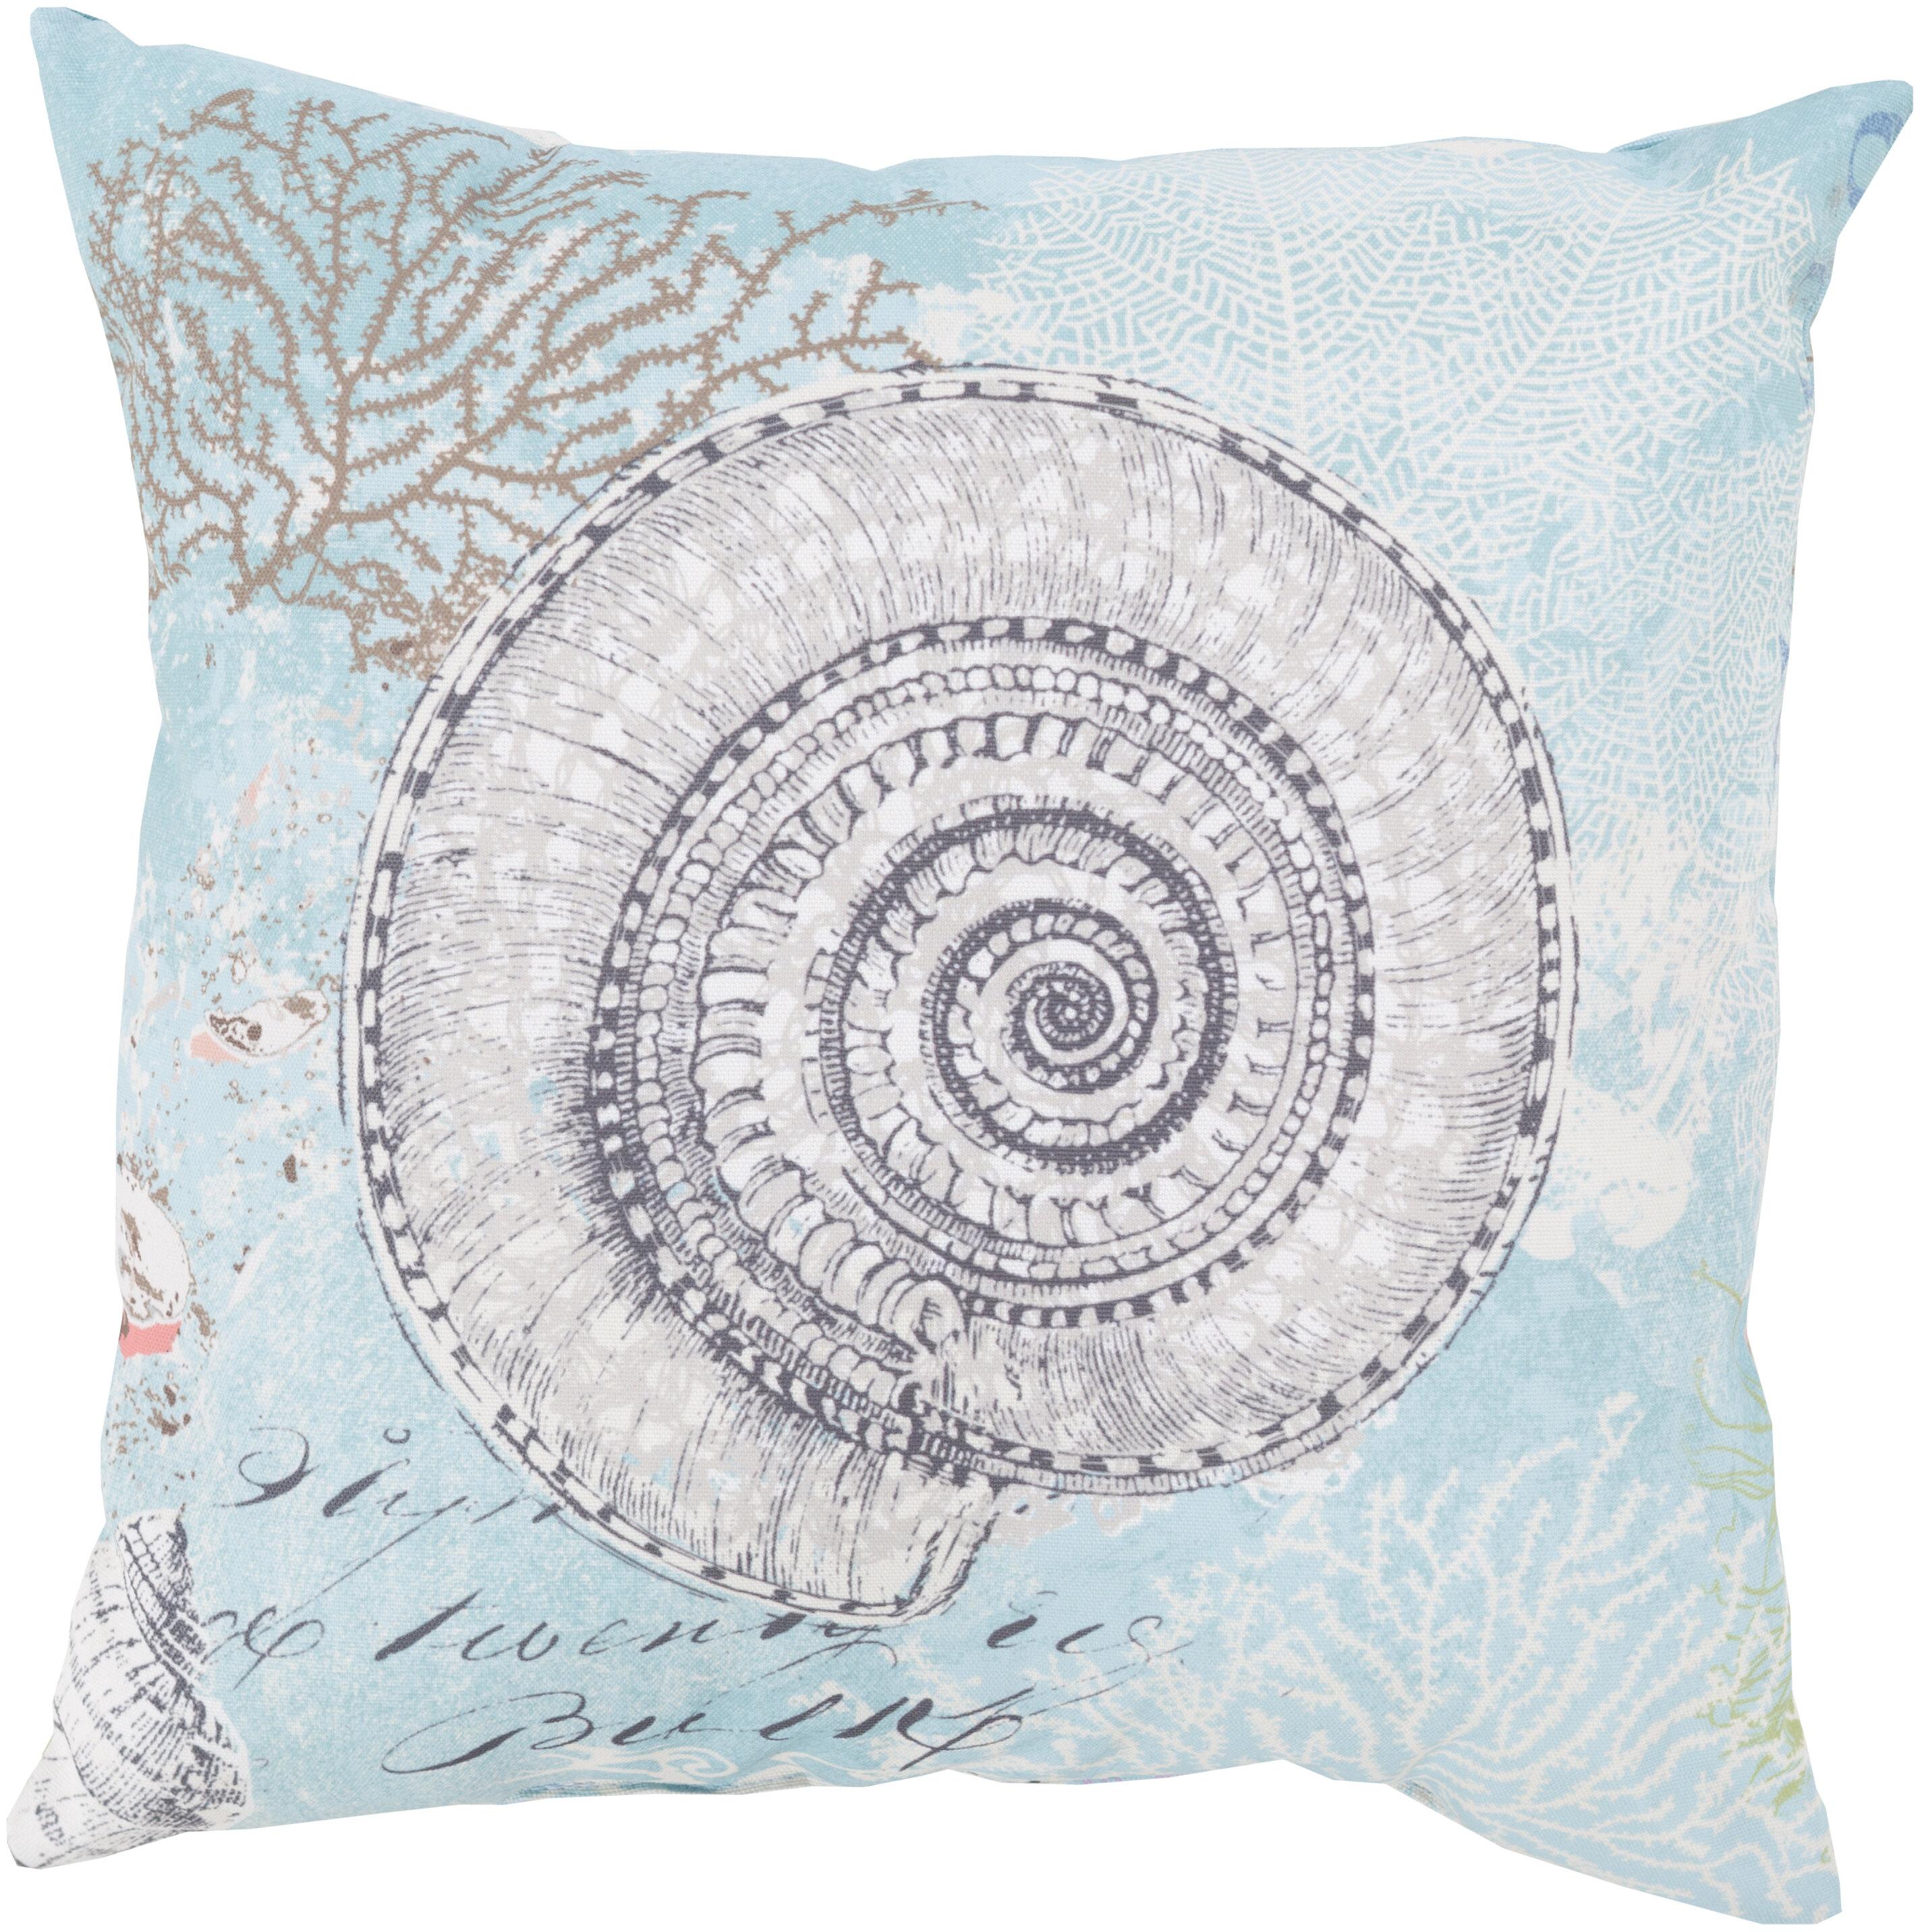 Highland Dunes Chaucer Mesmerizing Sea Shell Outdoor Throw Pillow Reviews Wayfair